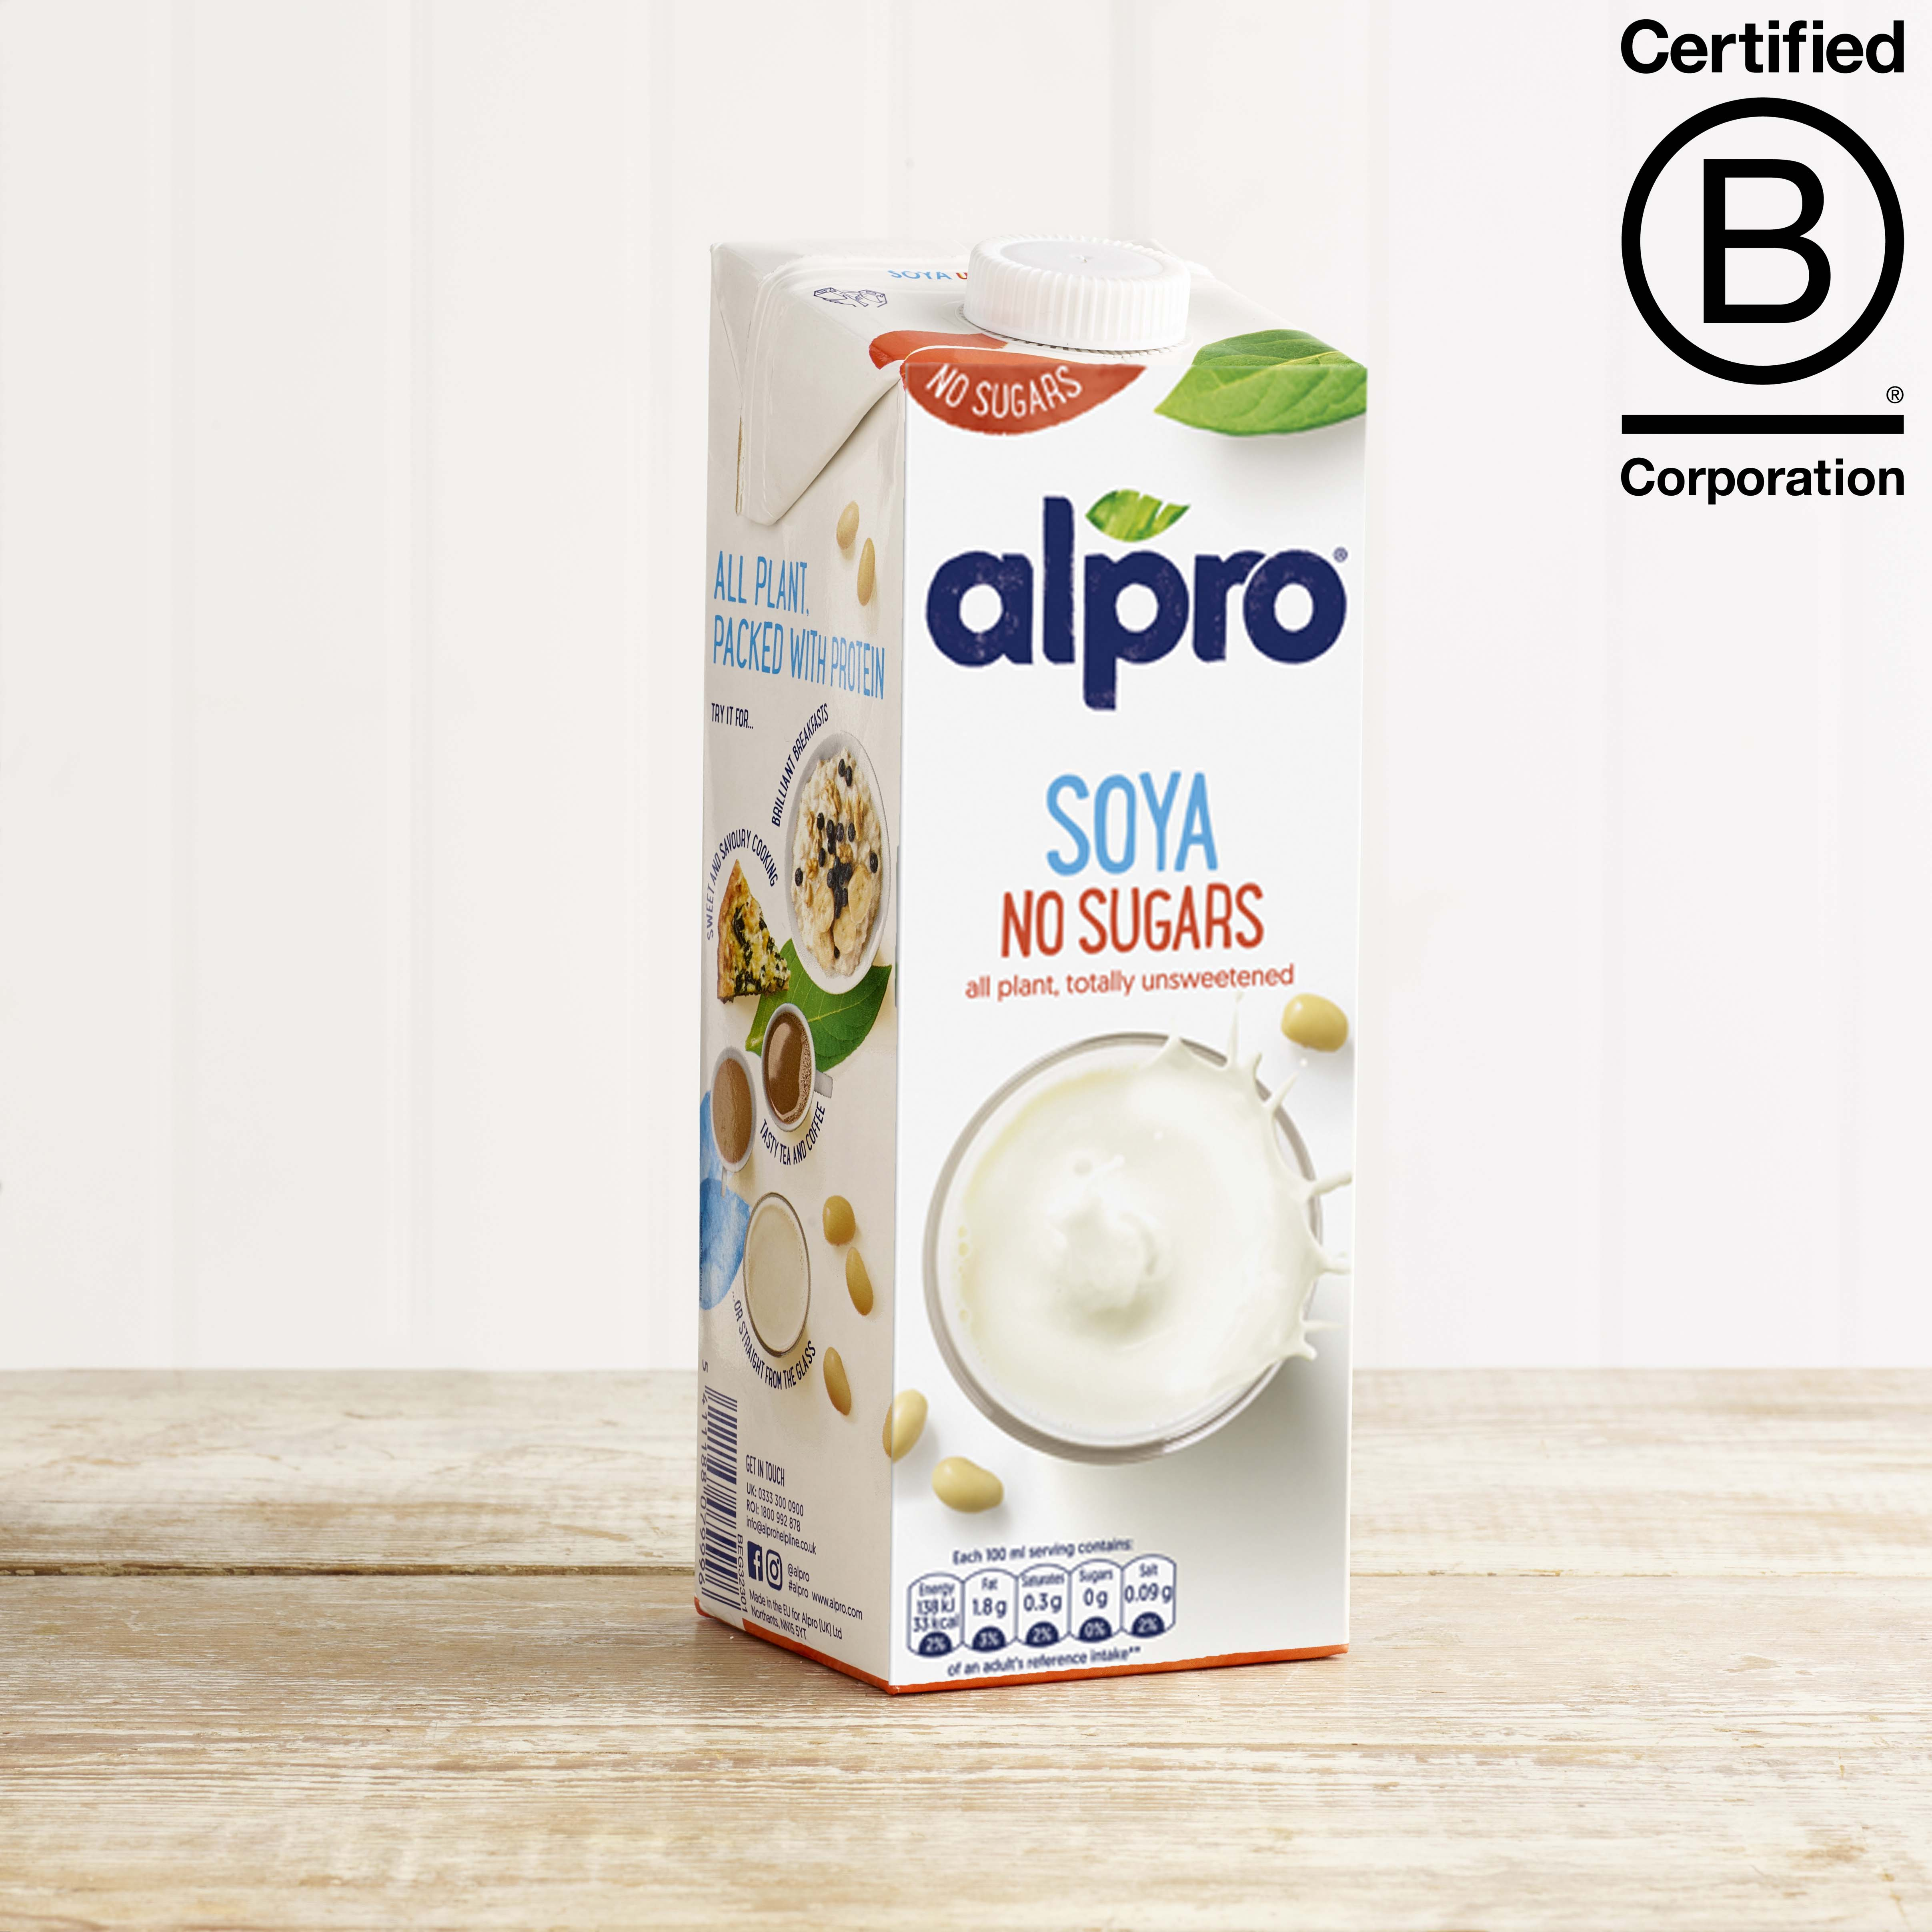 Alpro Soya No Sugar Longlife, 1L